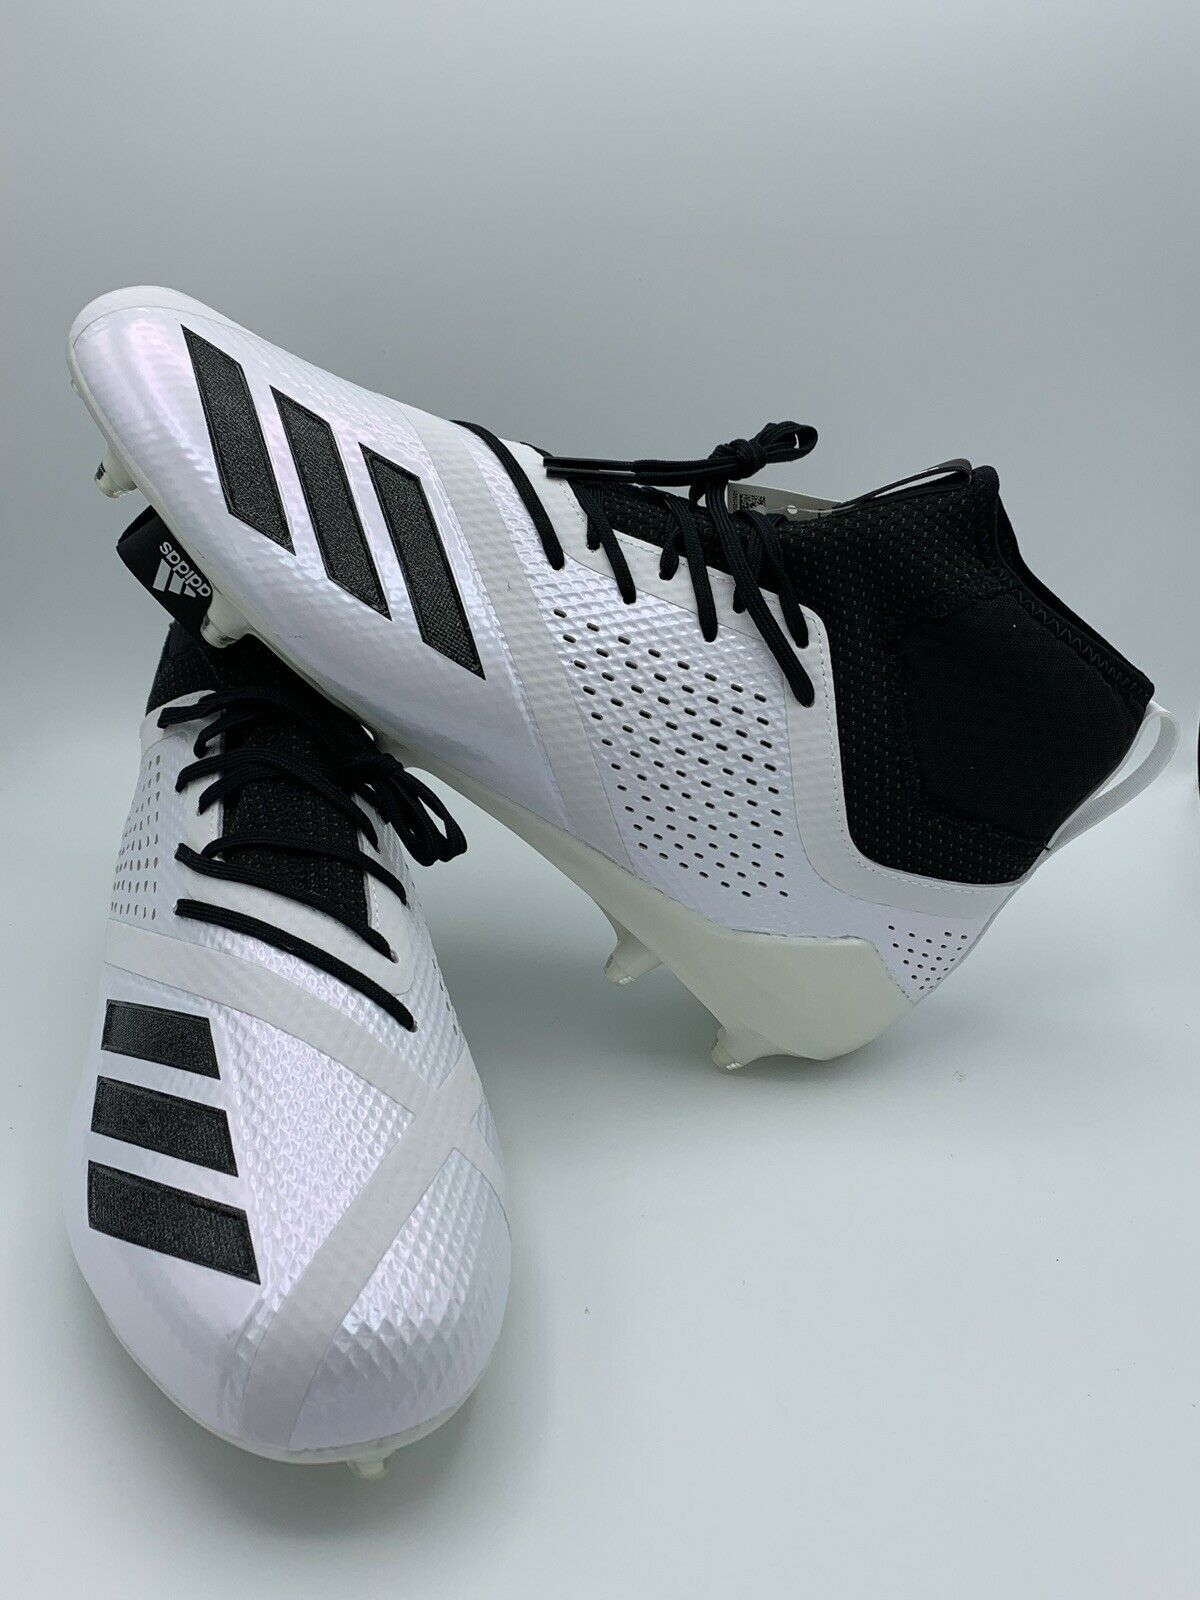 Mens Football adidas Adizero 5-Star 7.0